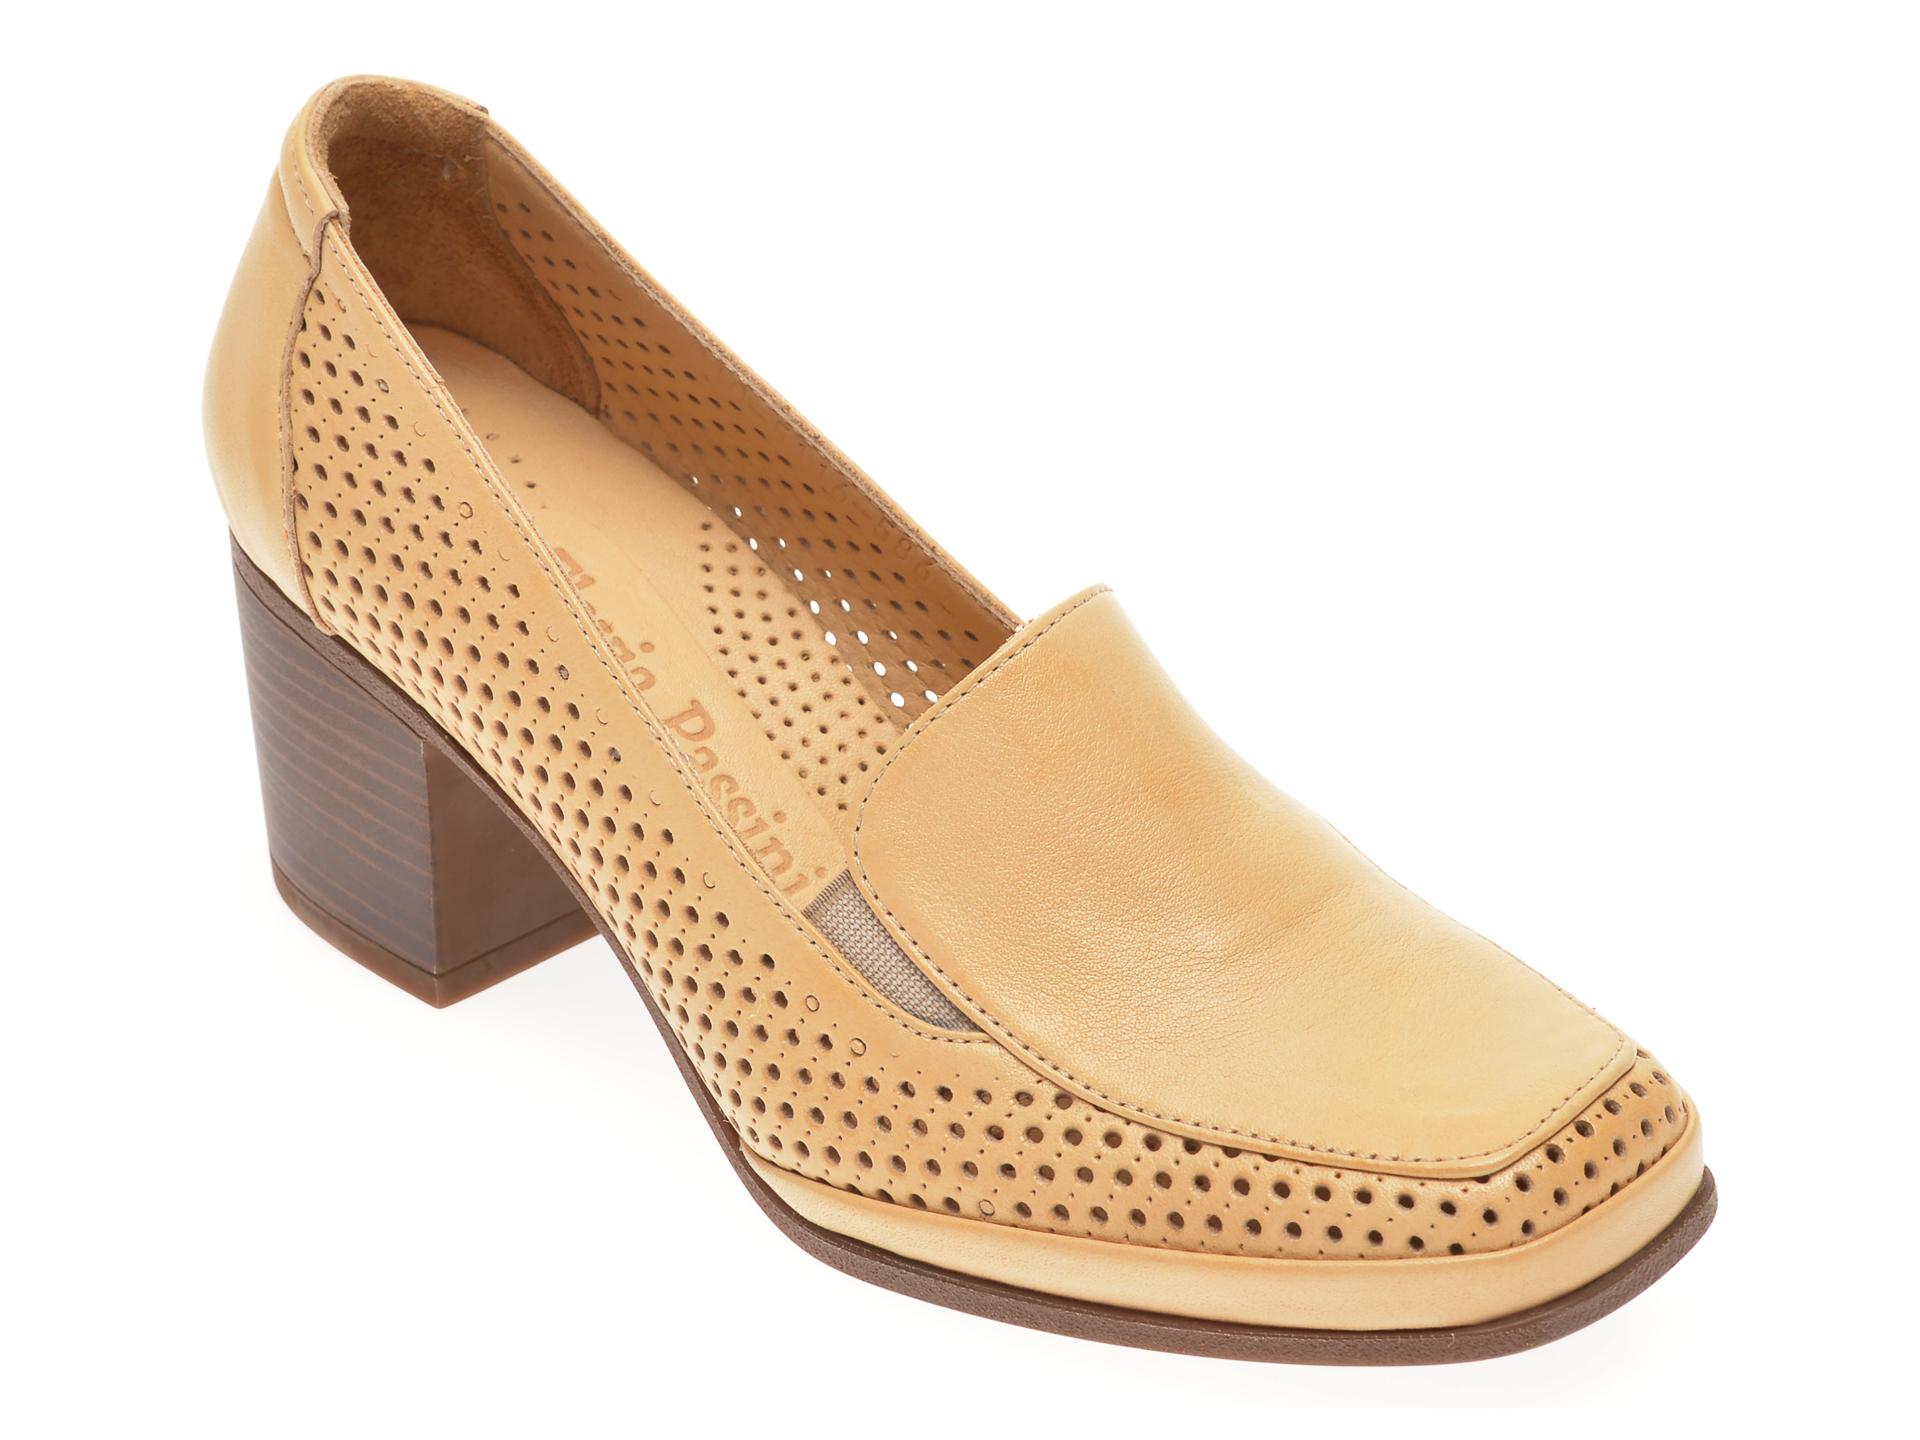 Pantofi FLAVIA PASSINI bej, 0105116, din piele naturala